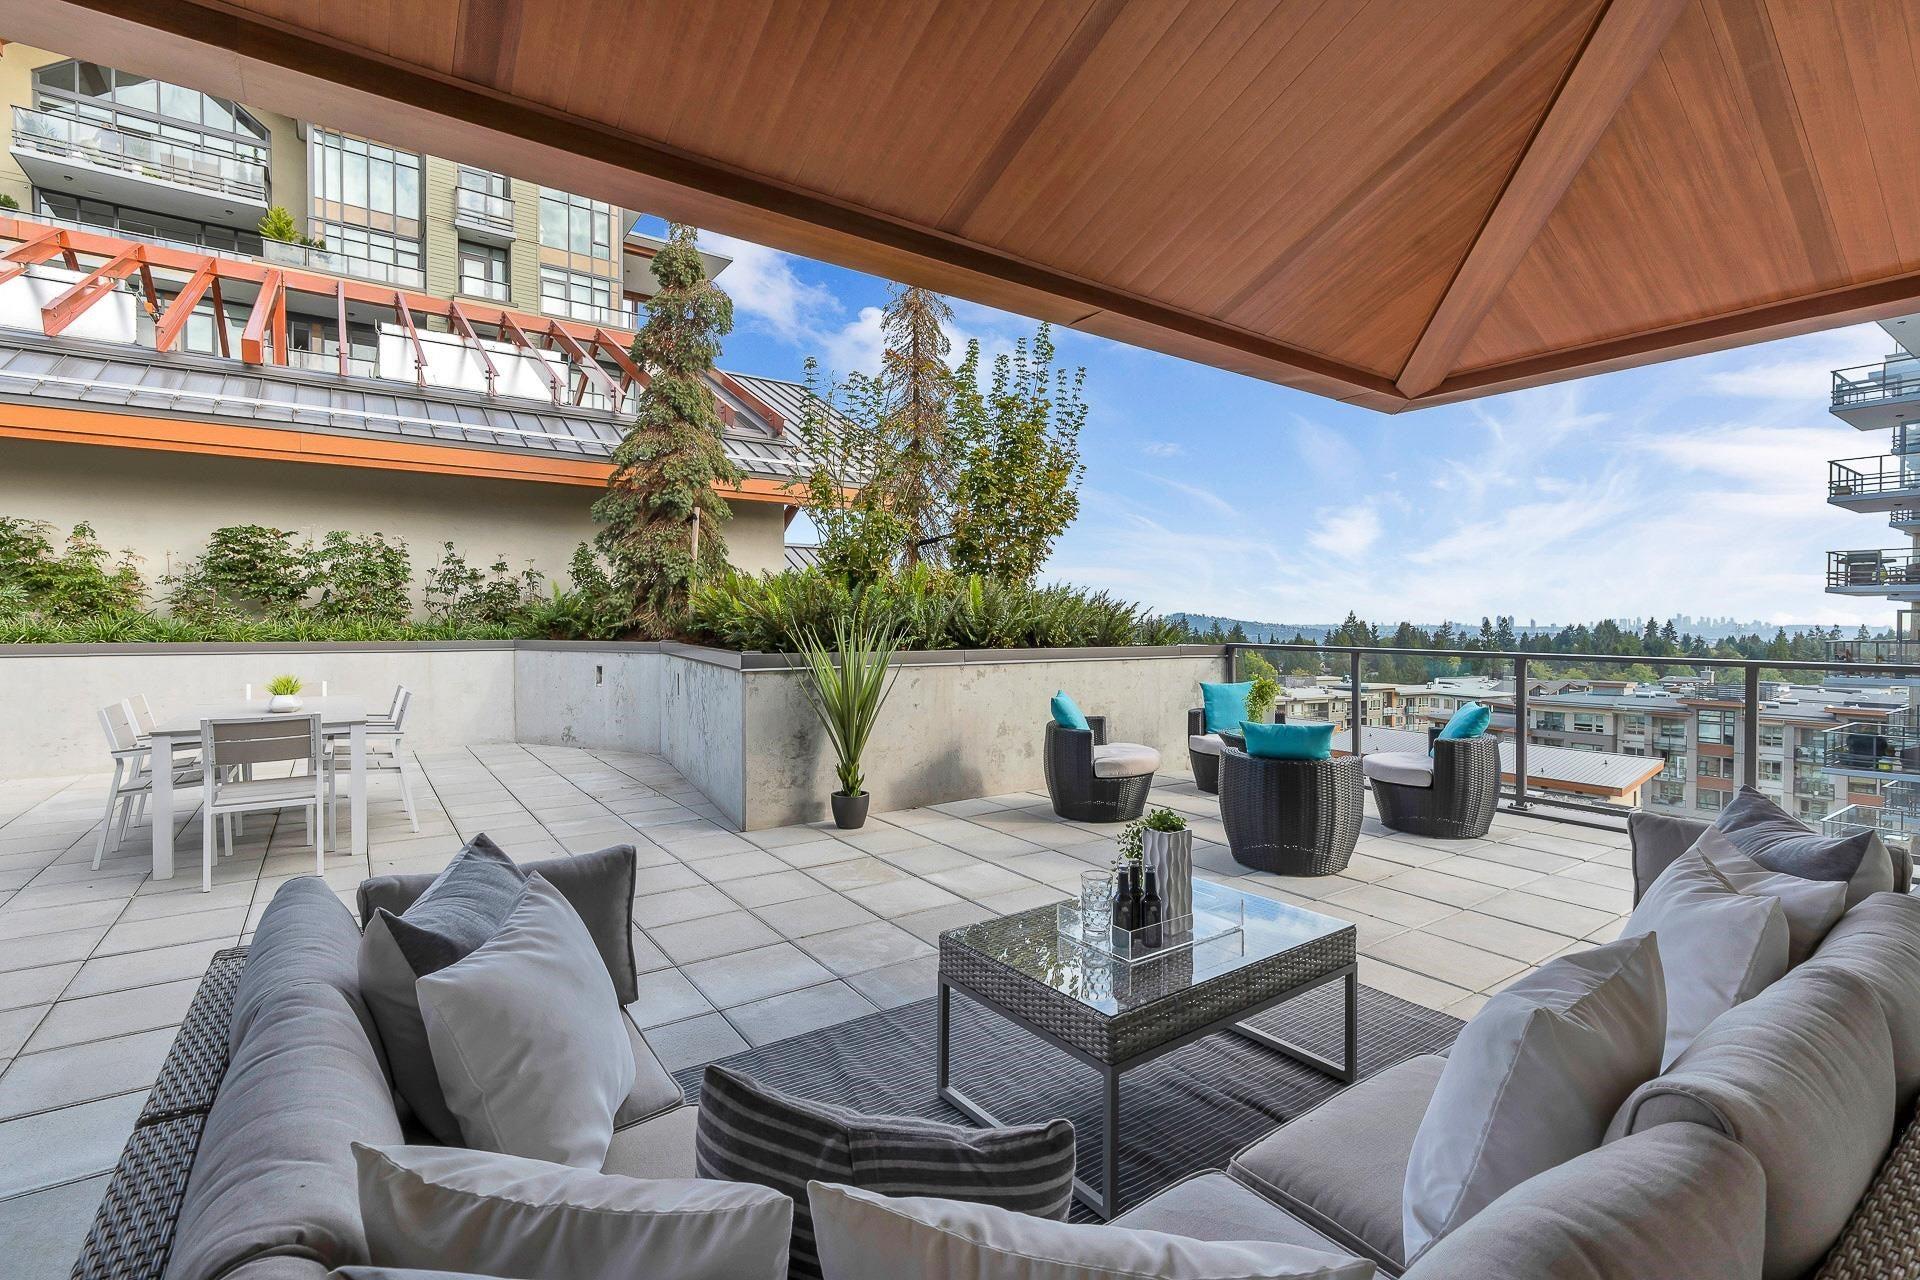 702 2780 VALLEY CENTRE AVENUE - Lynn Valley Apartment/Condo for sale, 3 Bedrooms (R2622279) - #26